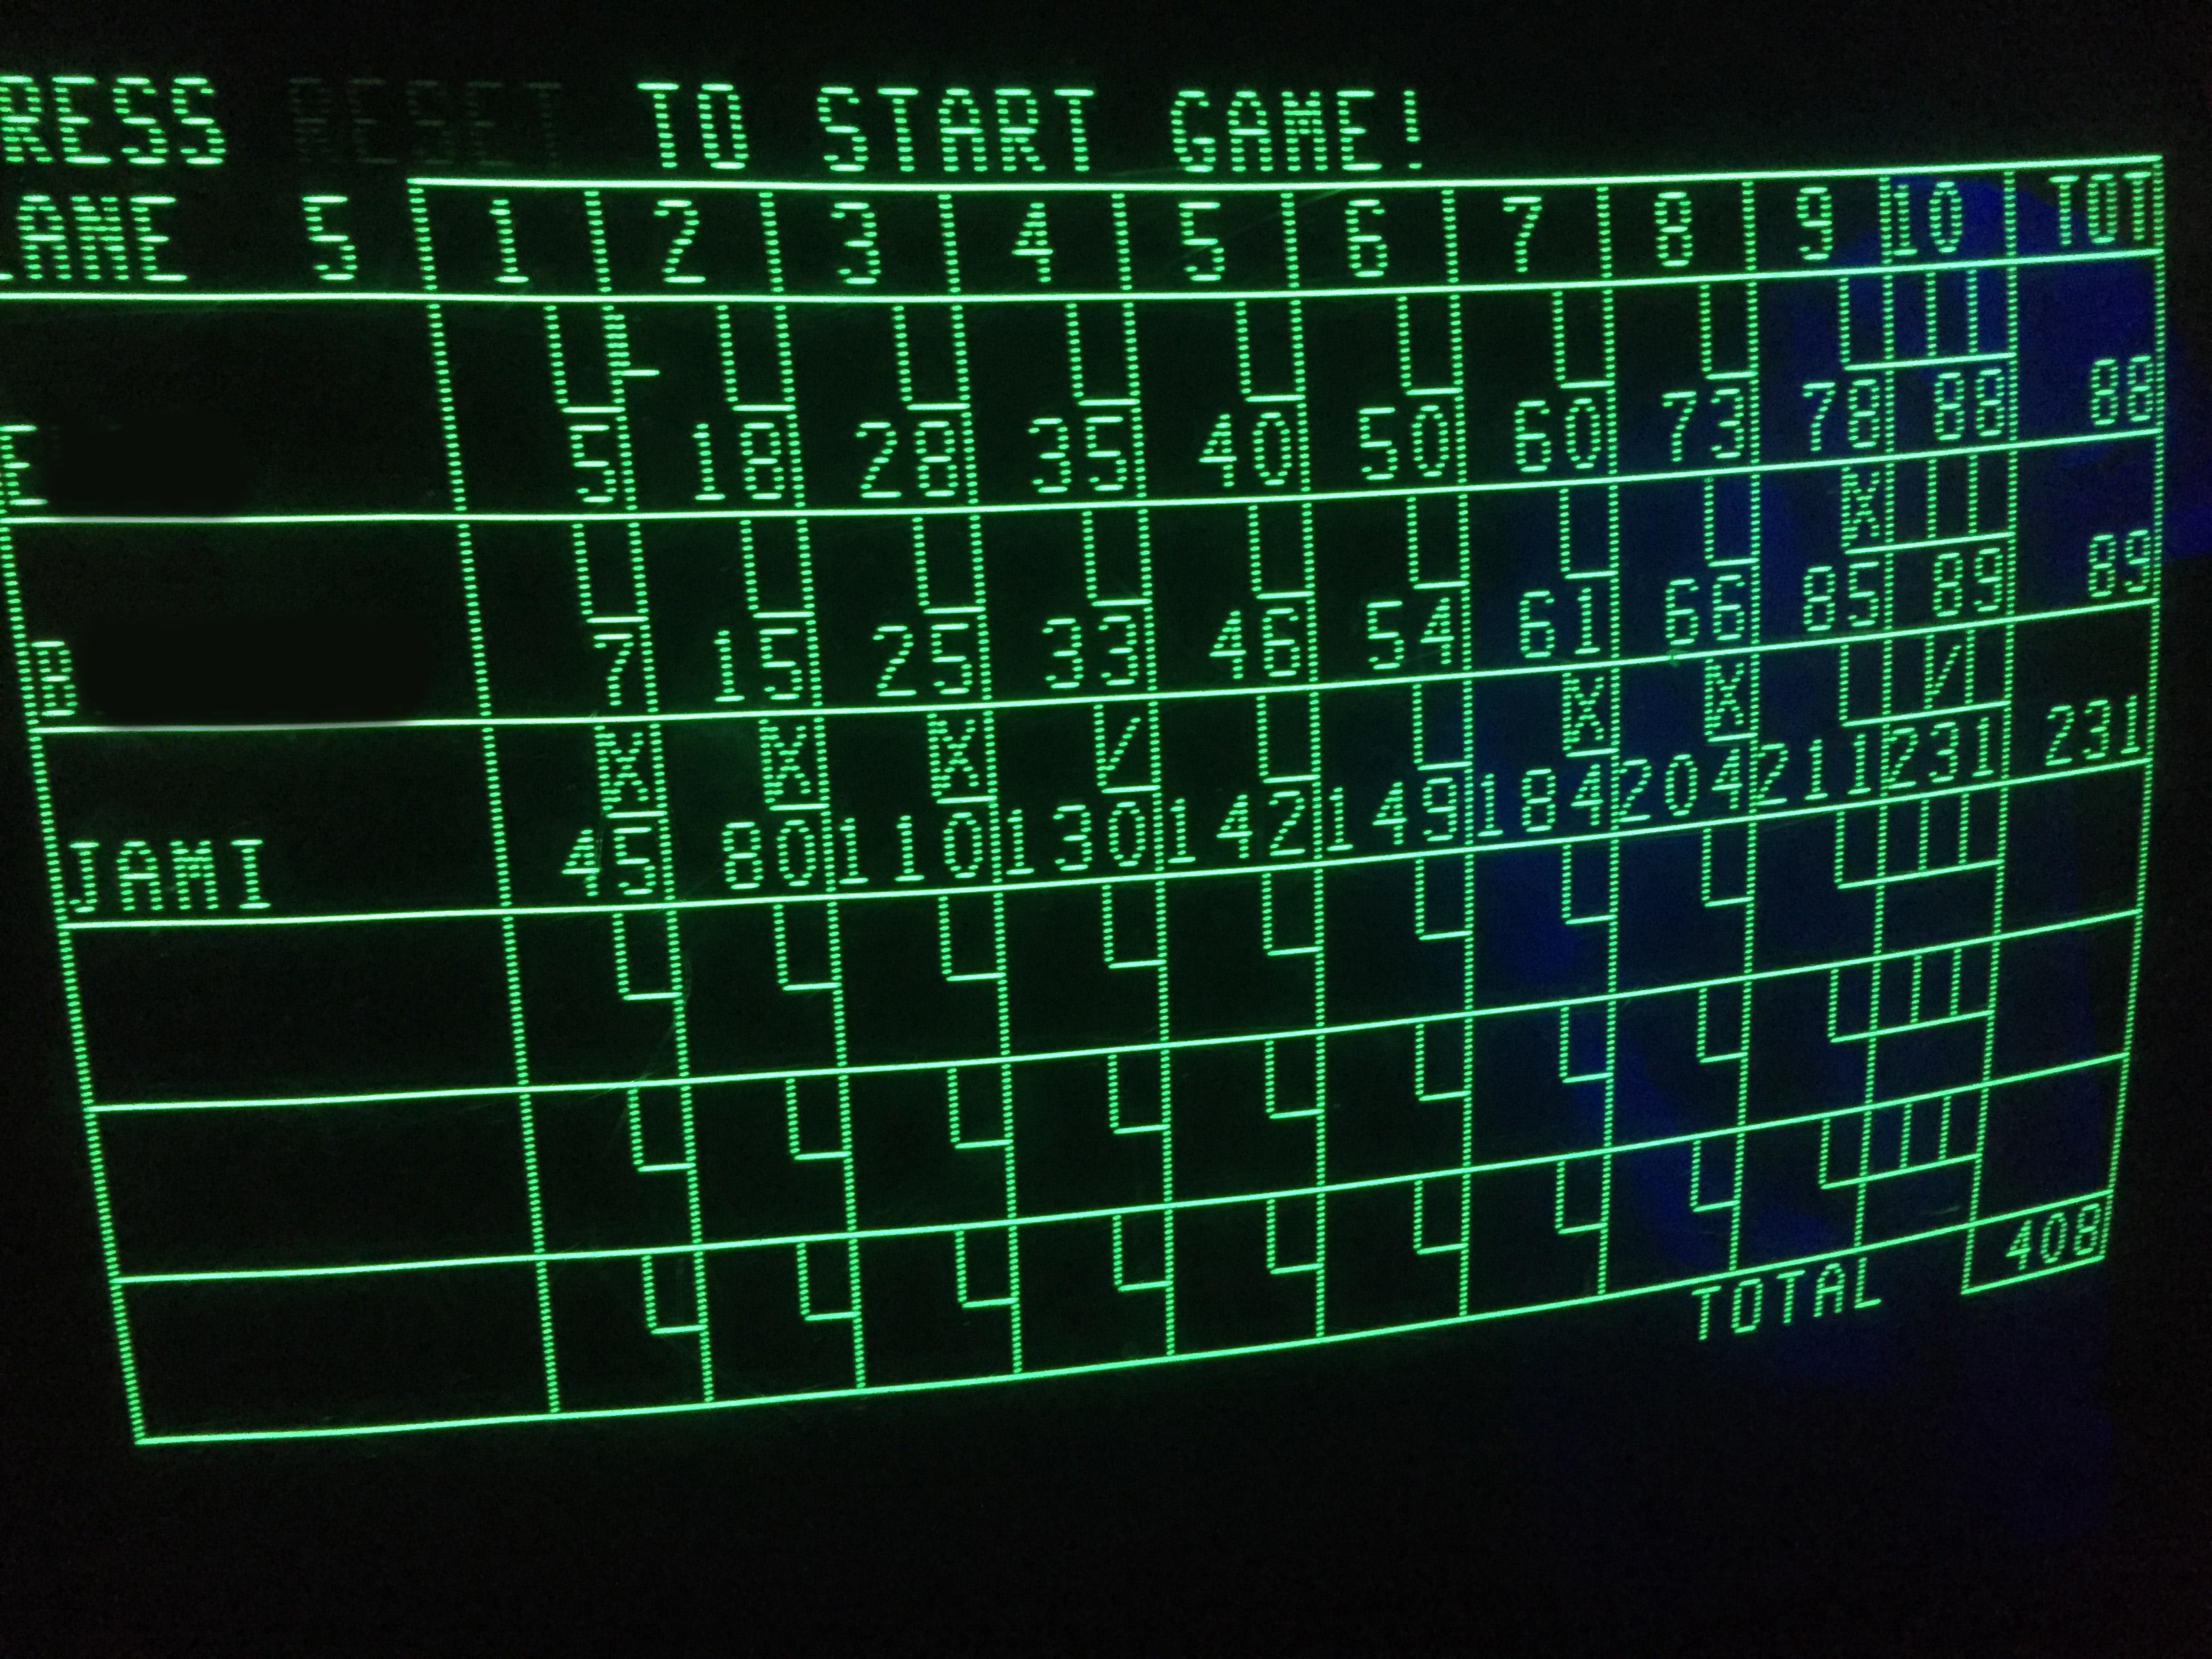 bowling-scorecard-at-juniper-lanes-in-cranbrook